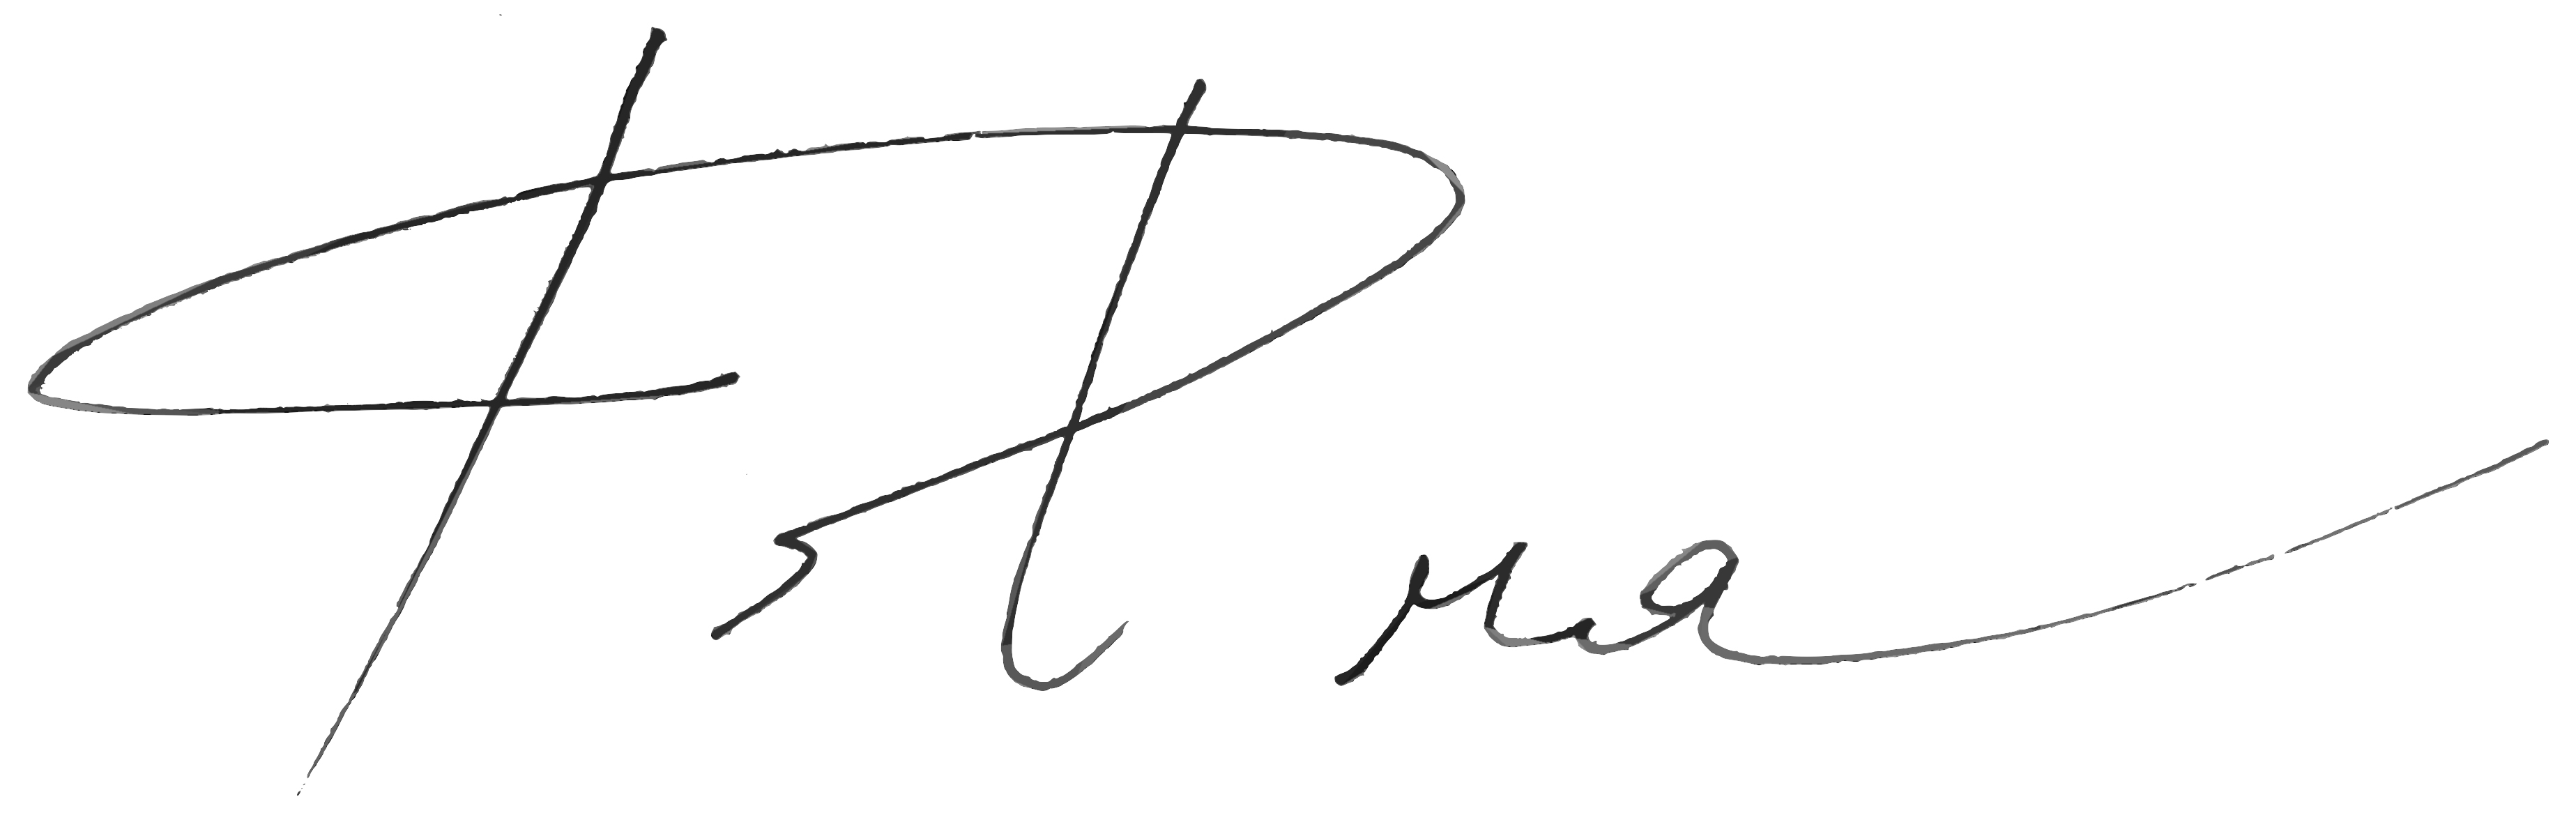 PETRA KNEZIC Signature